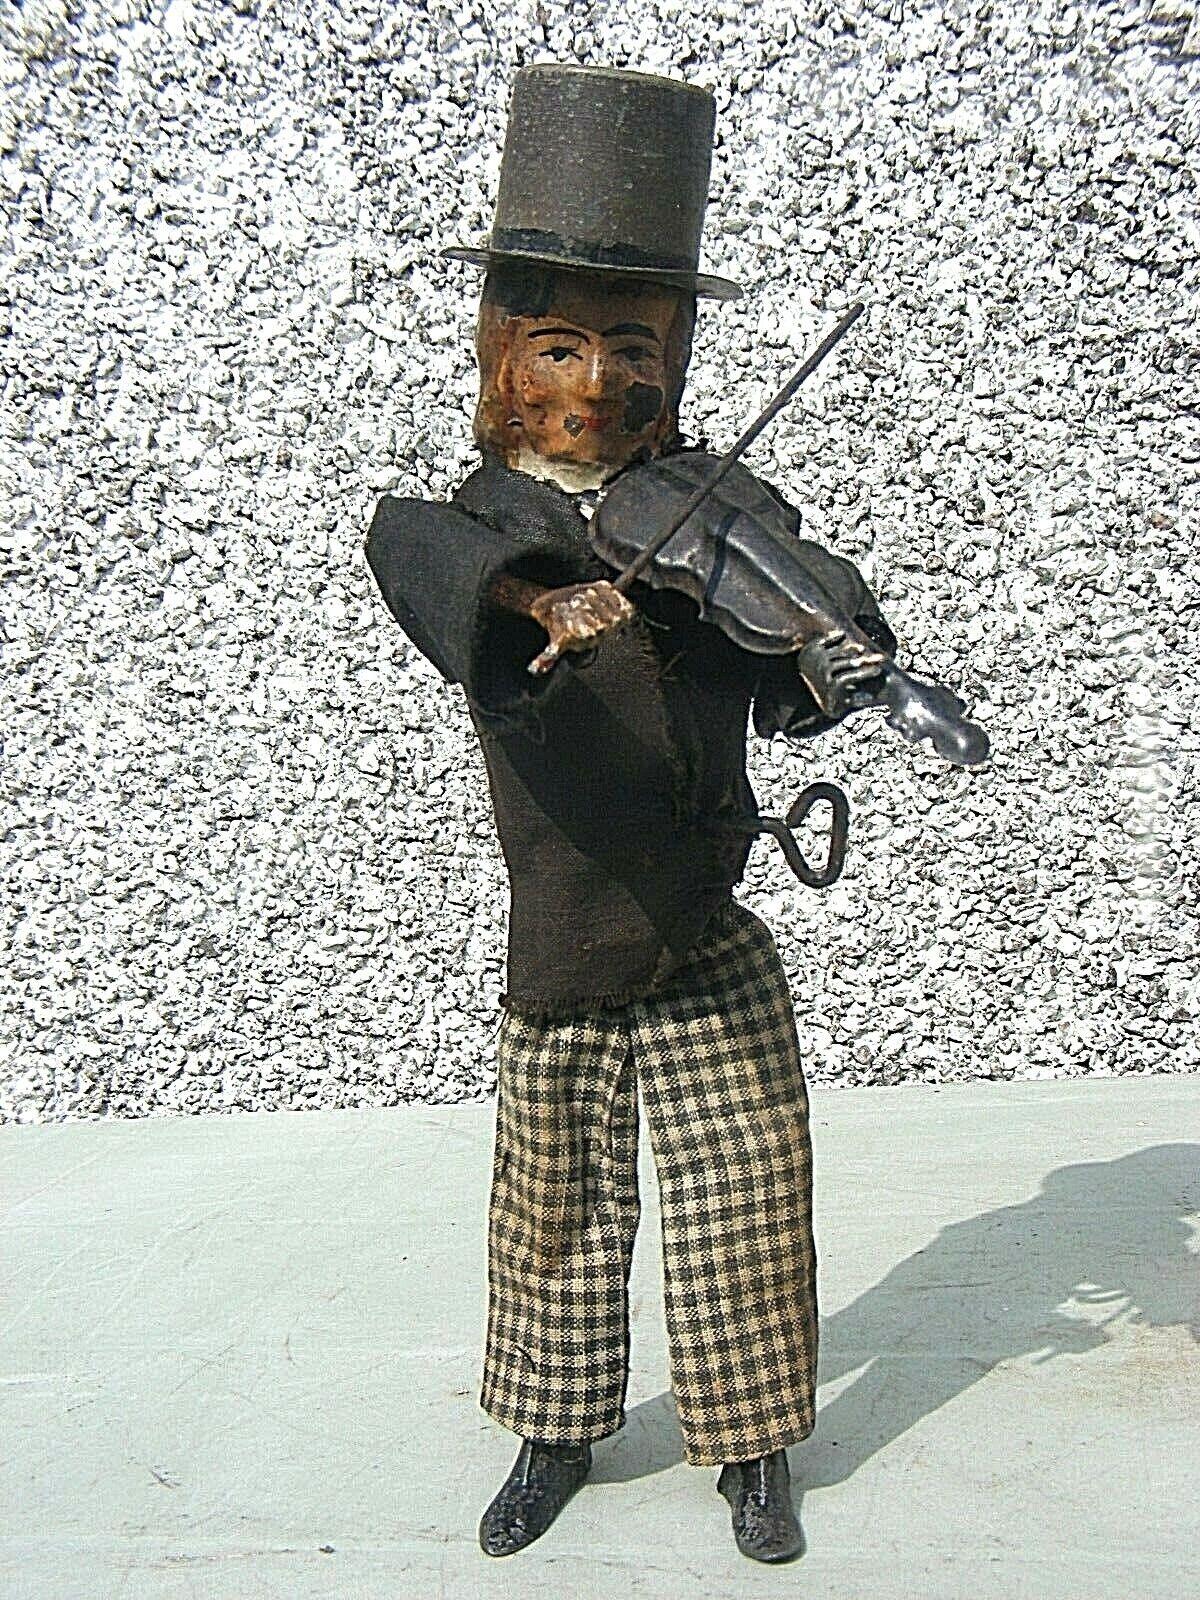 Antiguo Clockwork Hojalata Juguete Fernando Martin violinista temprano Modelo